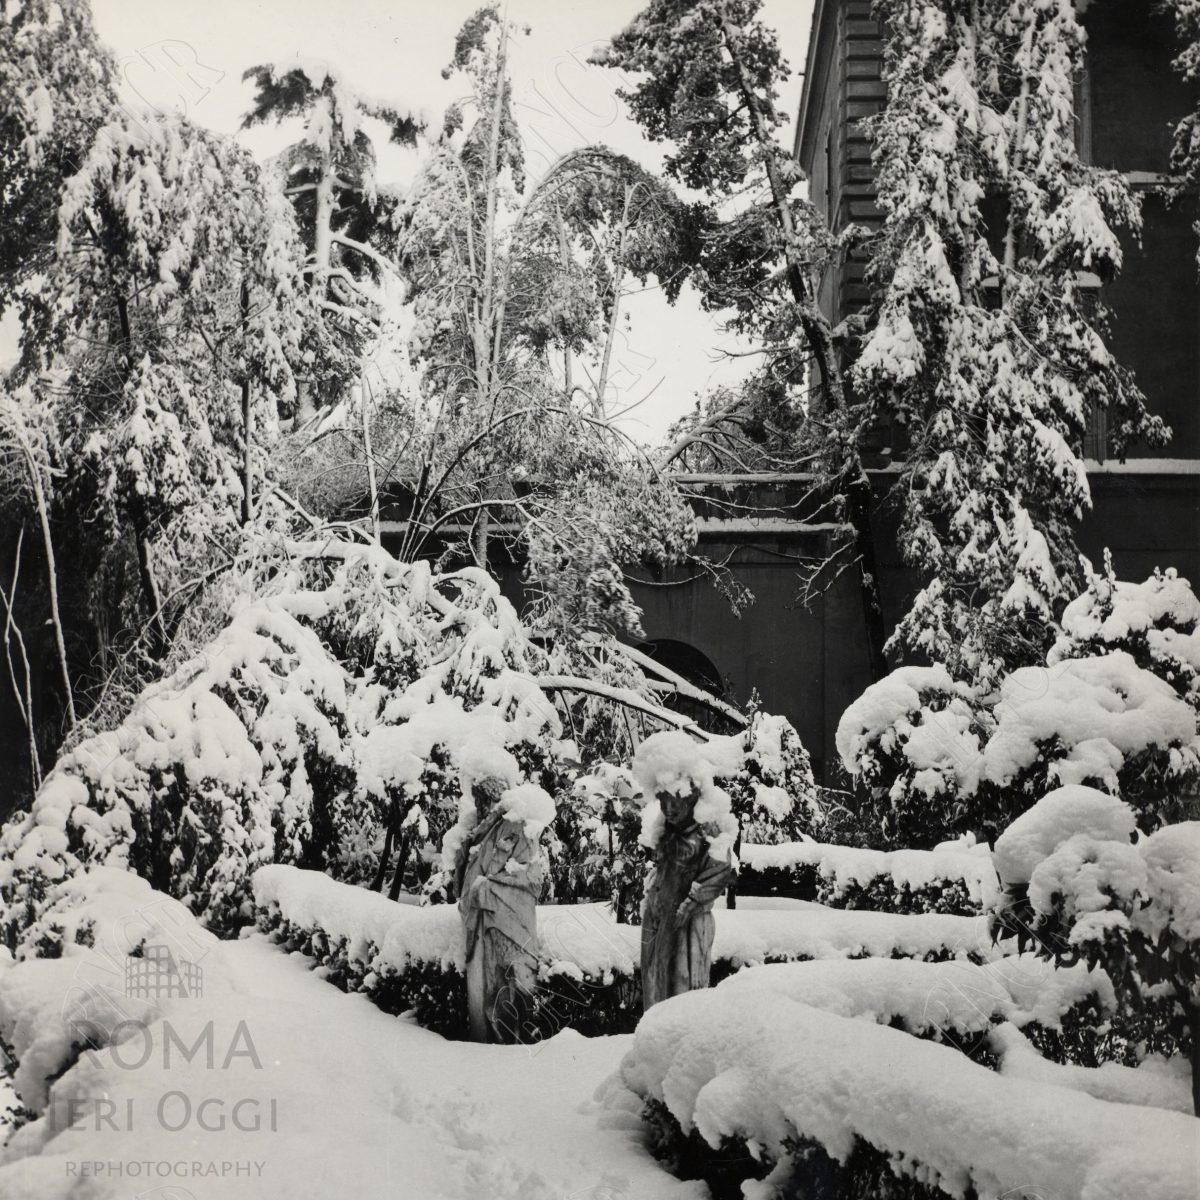 Sotto La neve 1965 Campidoglio 3